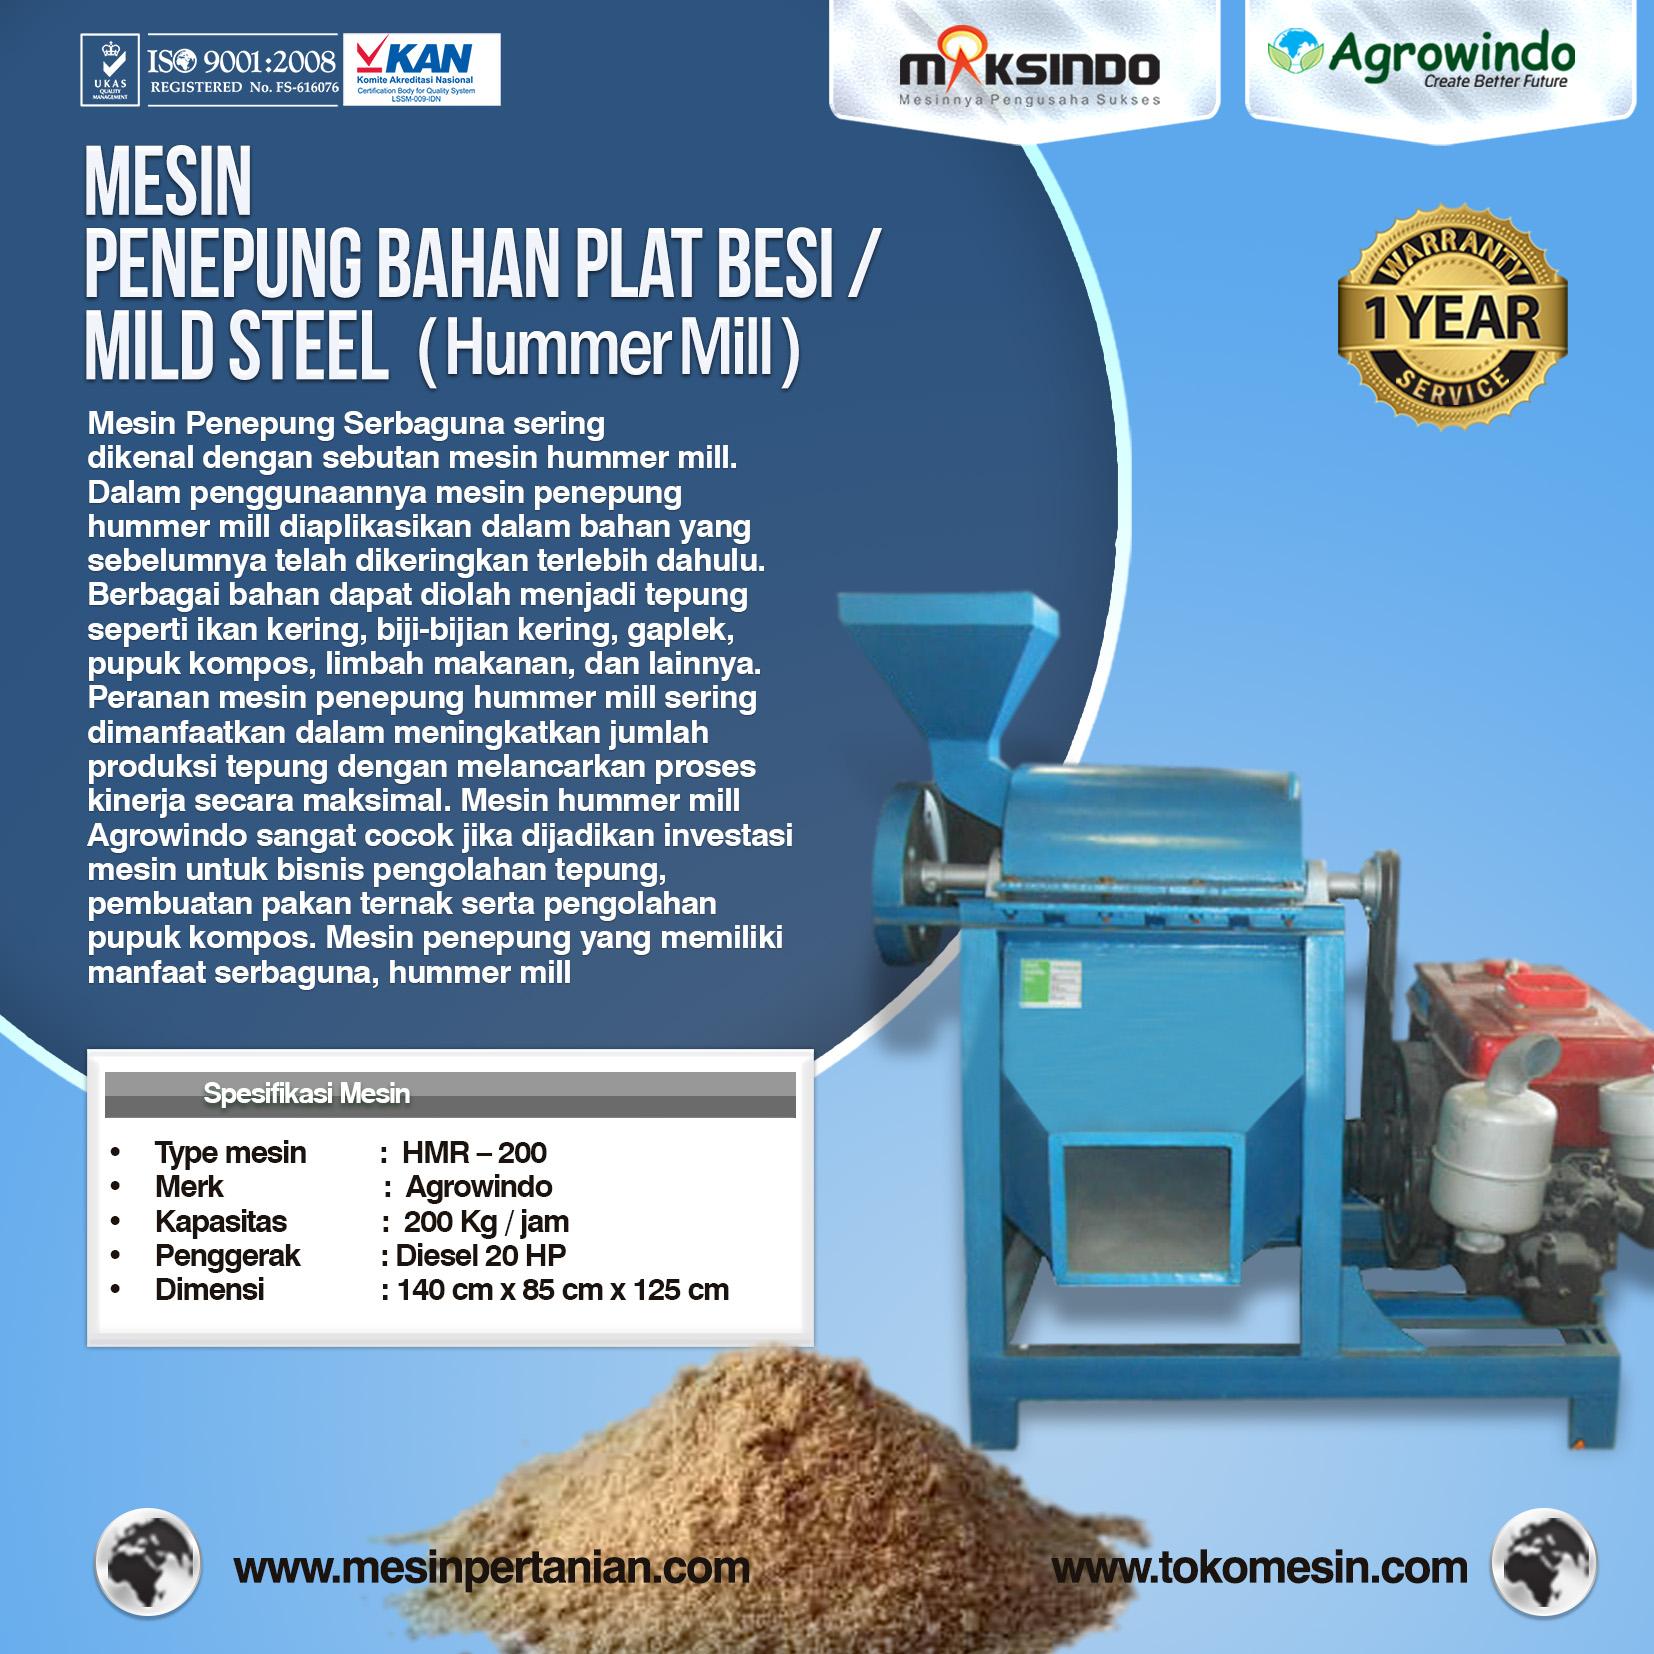 Mesin Penepung Hummer Mill Bahan Plat Besi HMR – 200